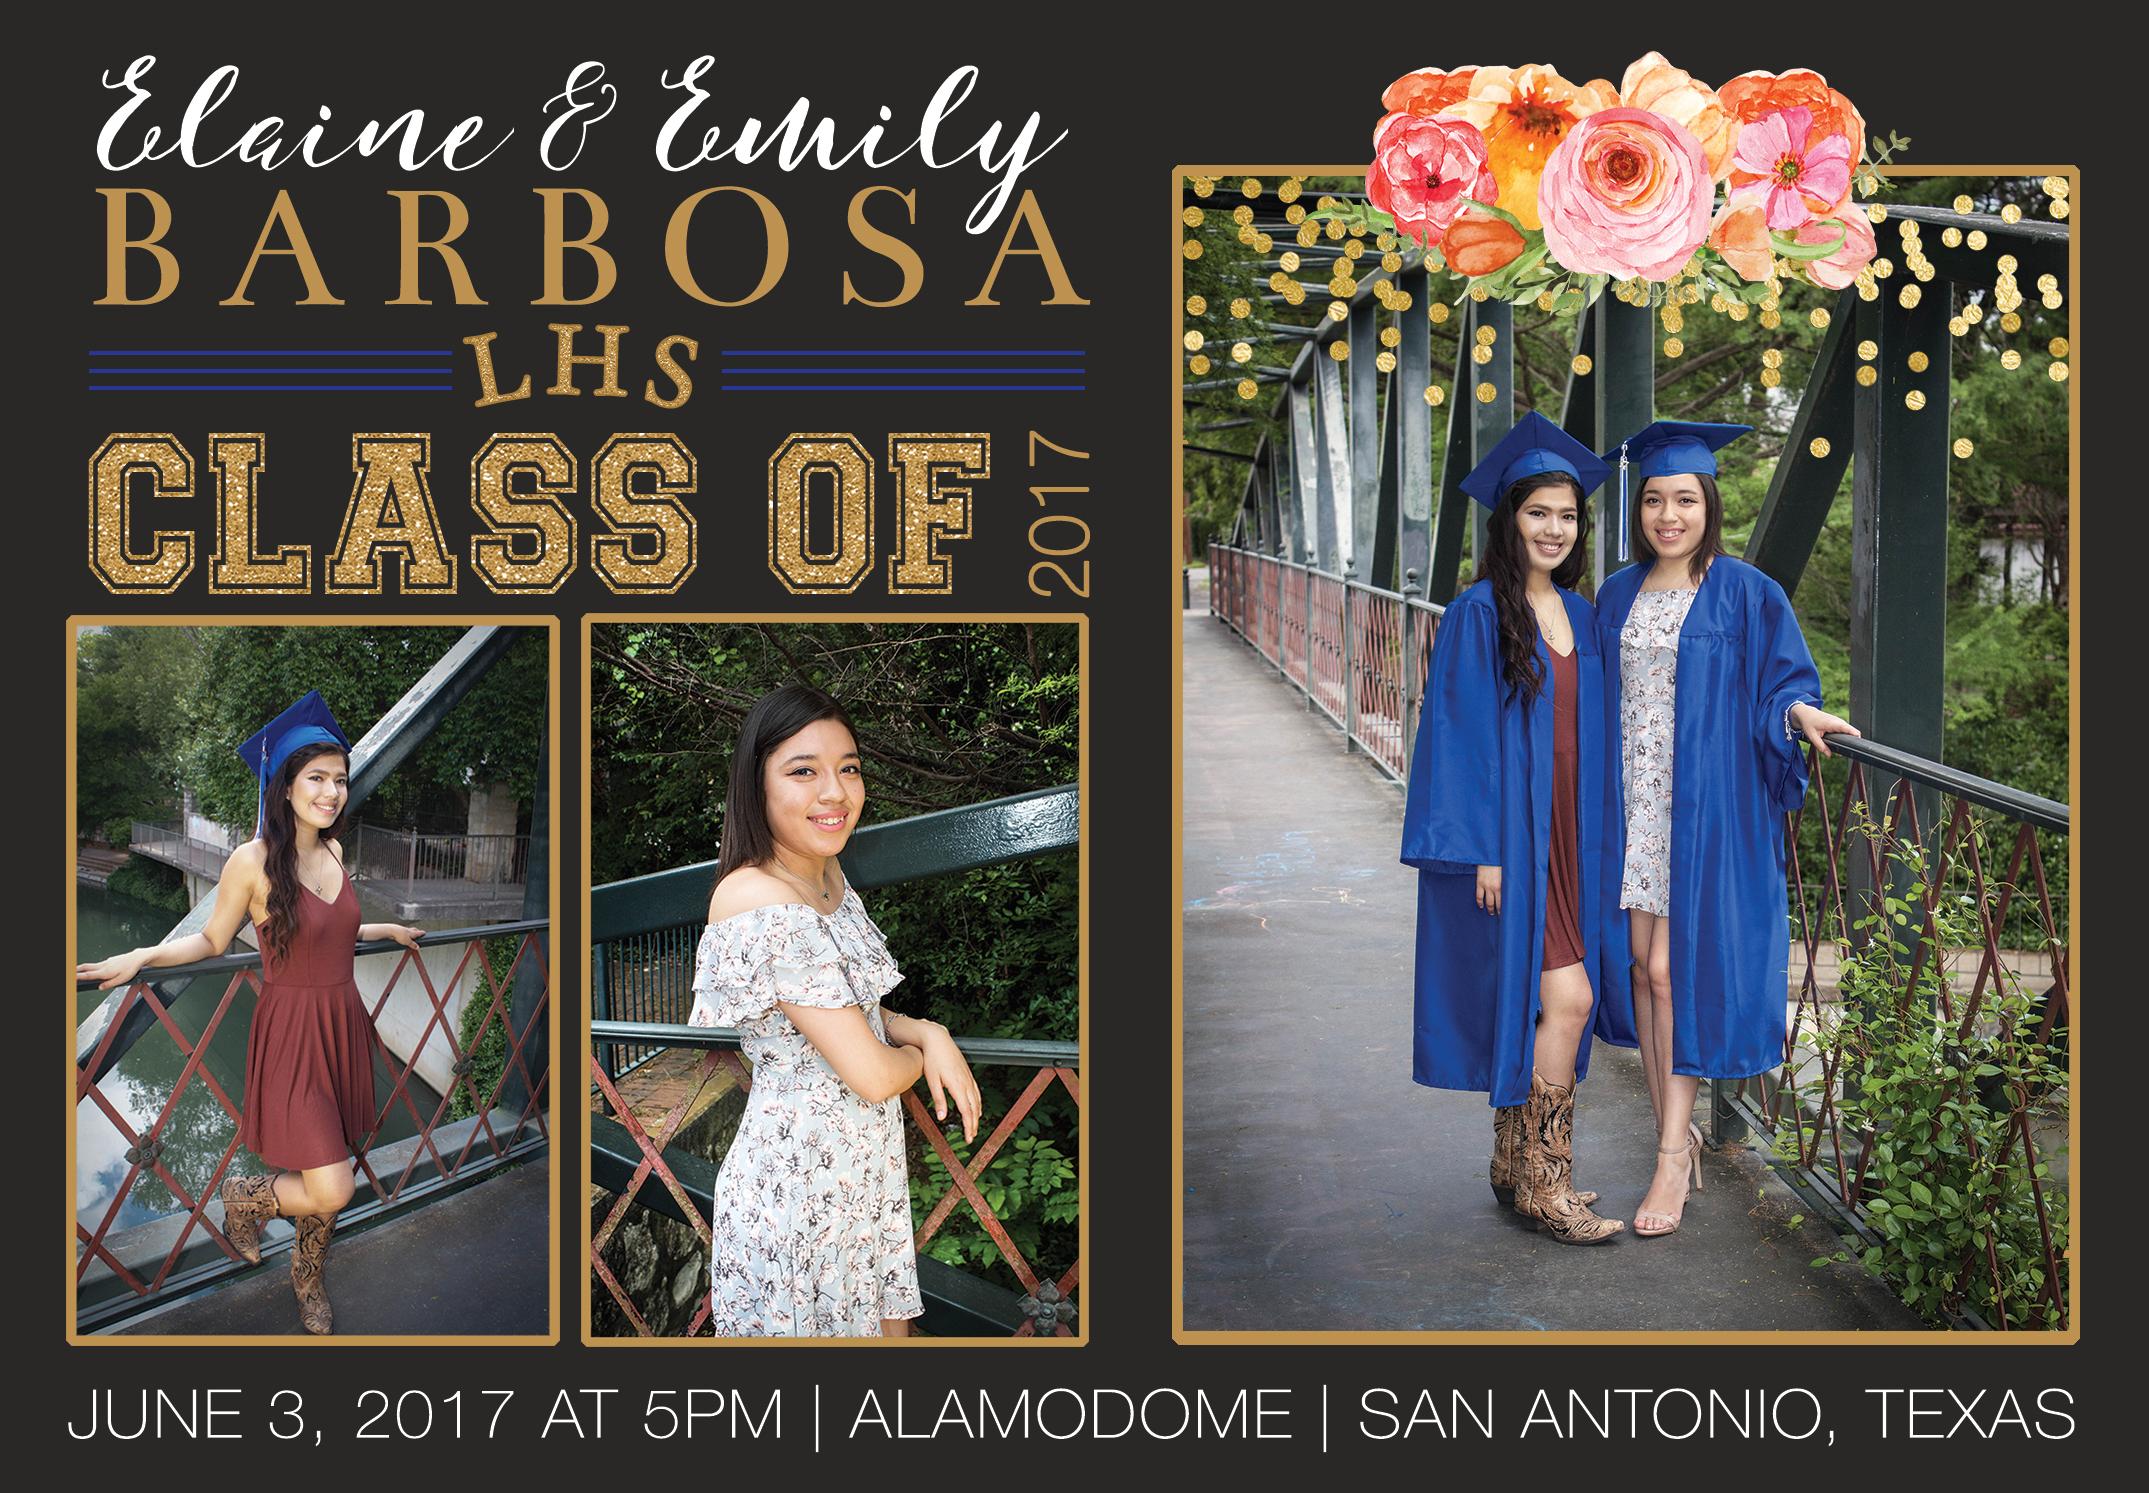 Graduation Announcement & Invitation